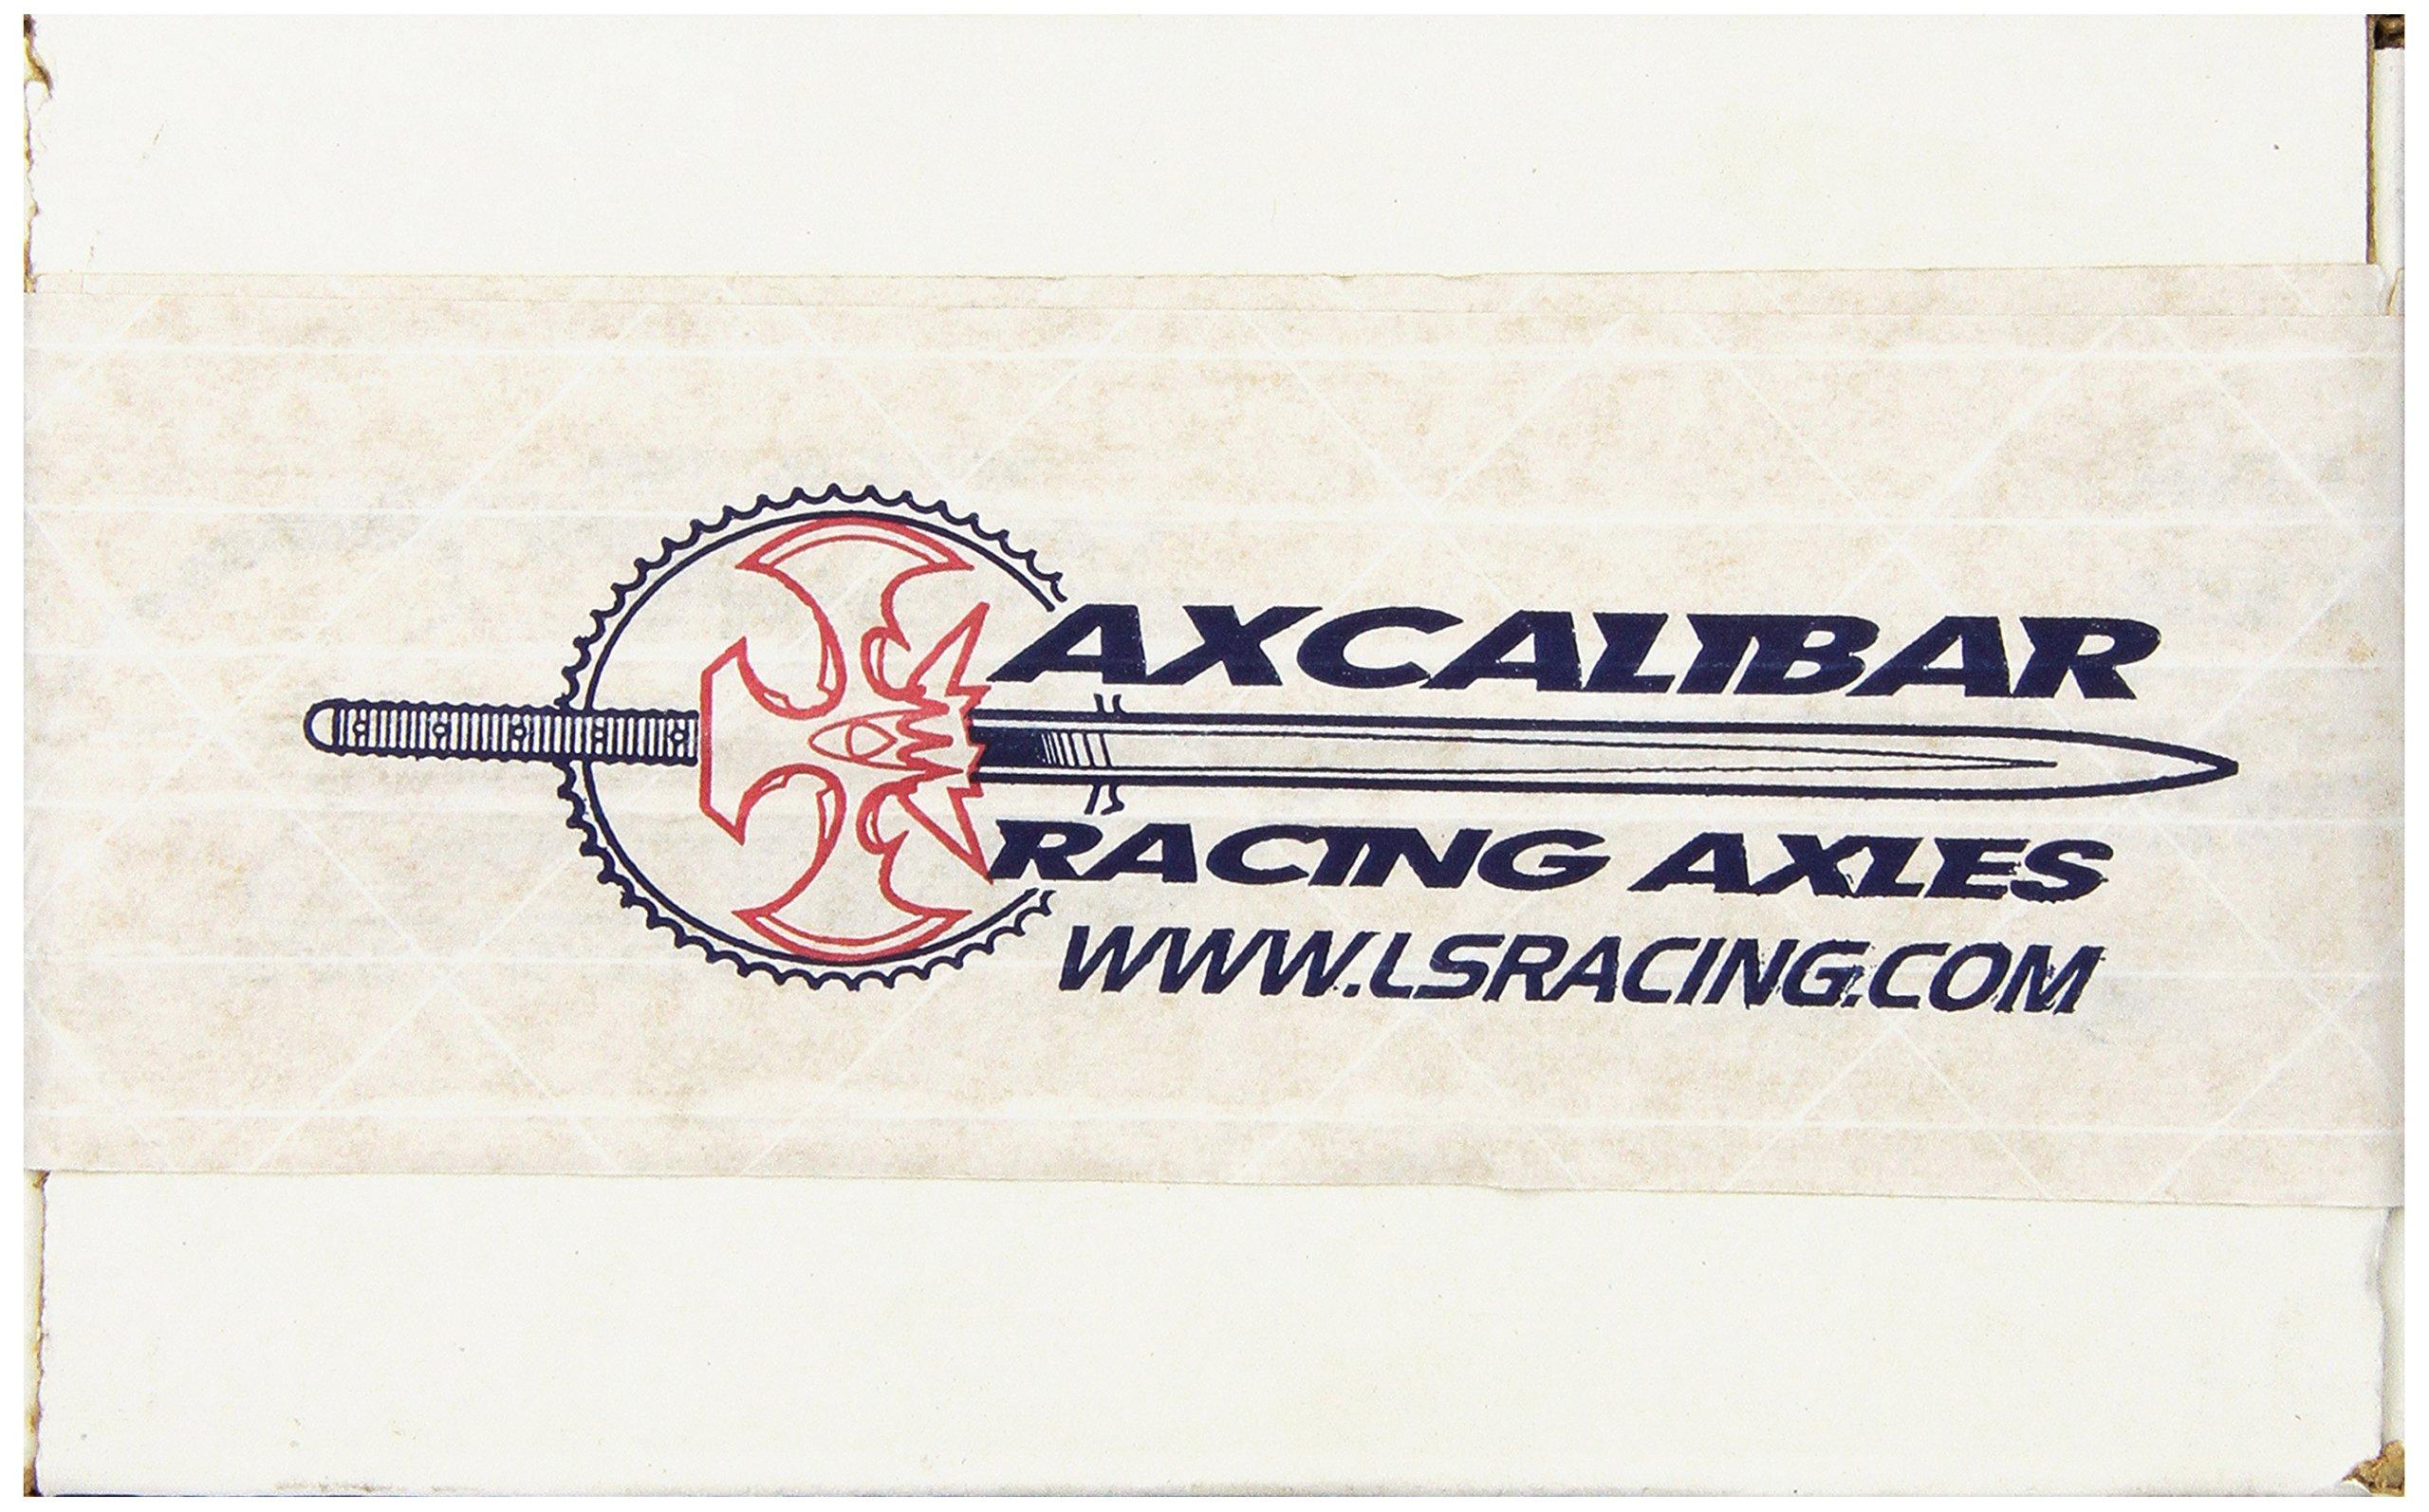 Lonestar Racing 11-161 Billet Aluminum Bearing Housing for Honda 250R/400EX